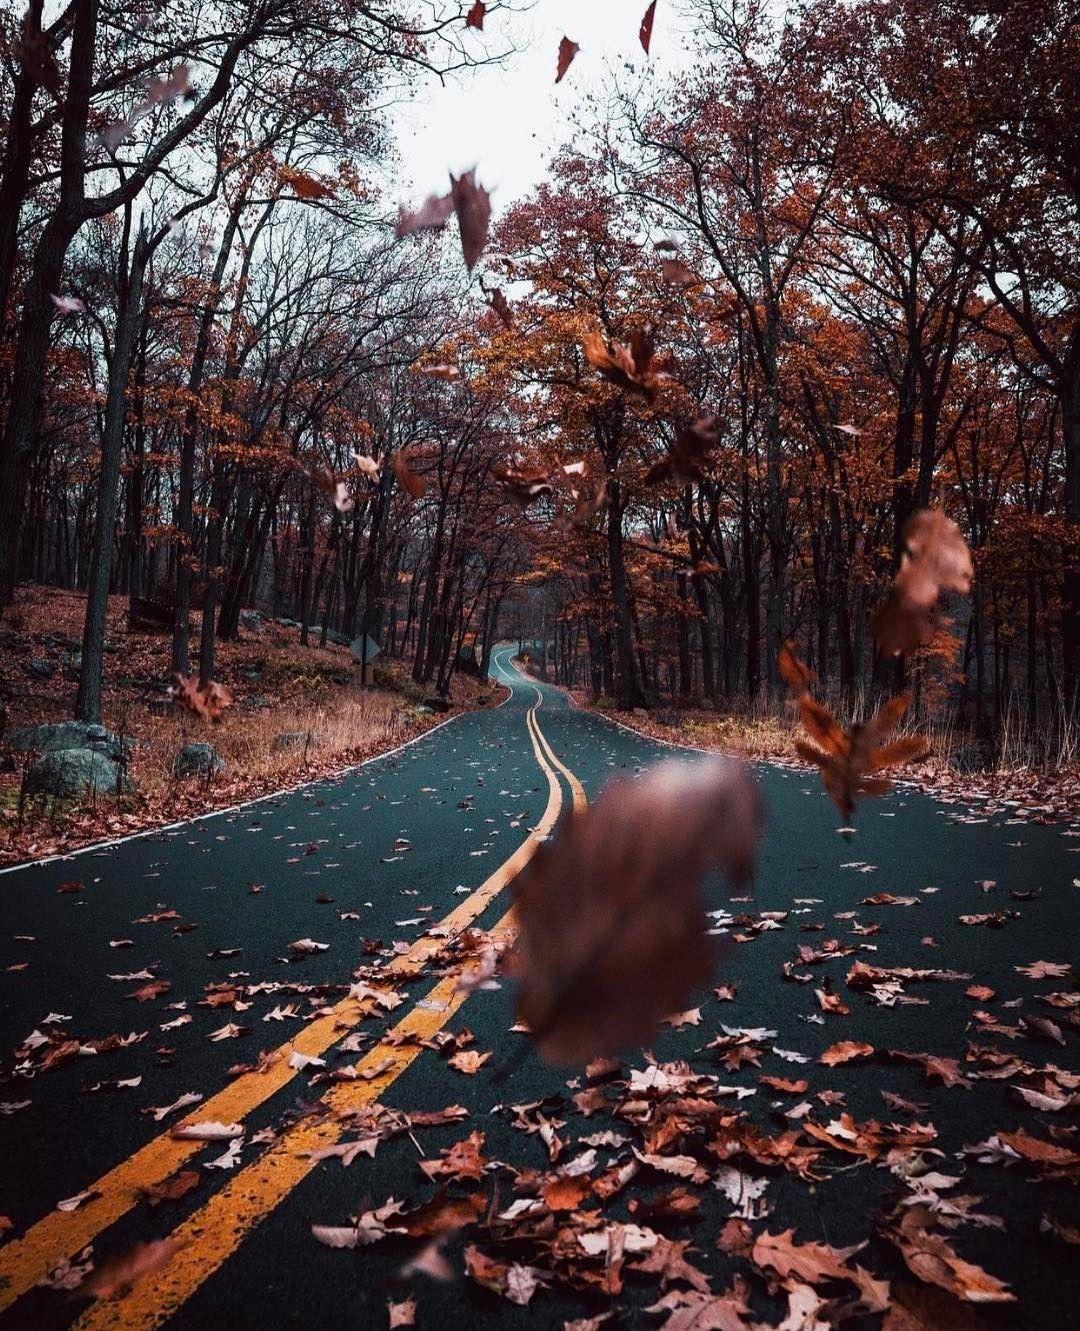 Autumn Mood Tumblr Fotografia Paisaje Paisaje De Fantasia Fondos De Pantalla Otono